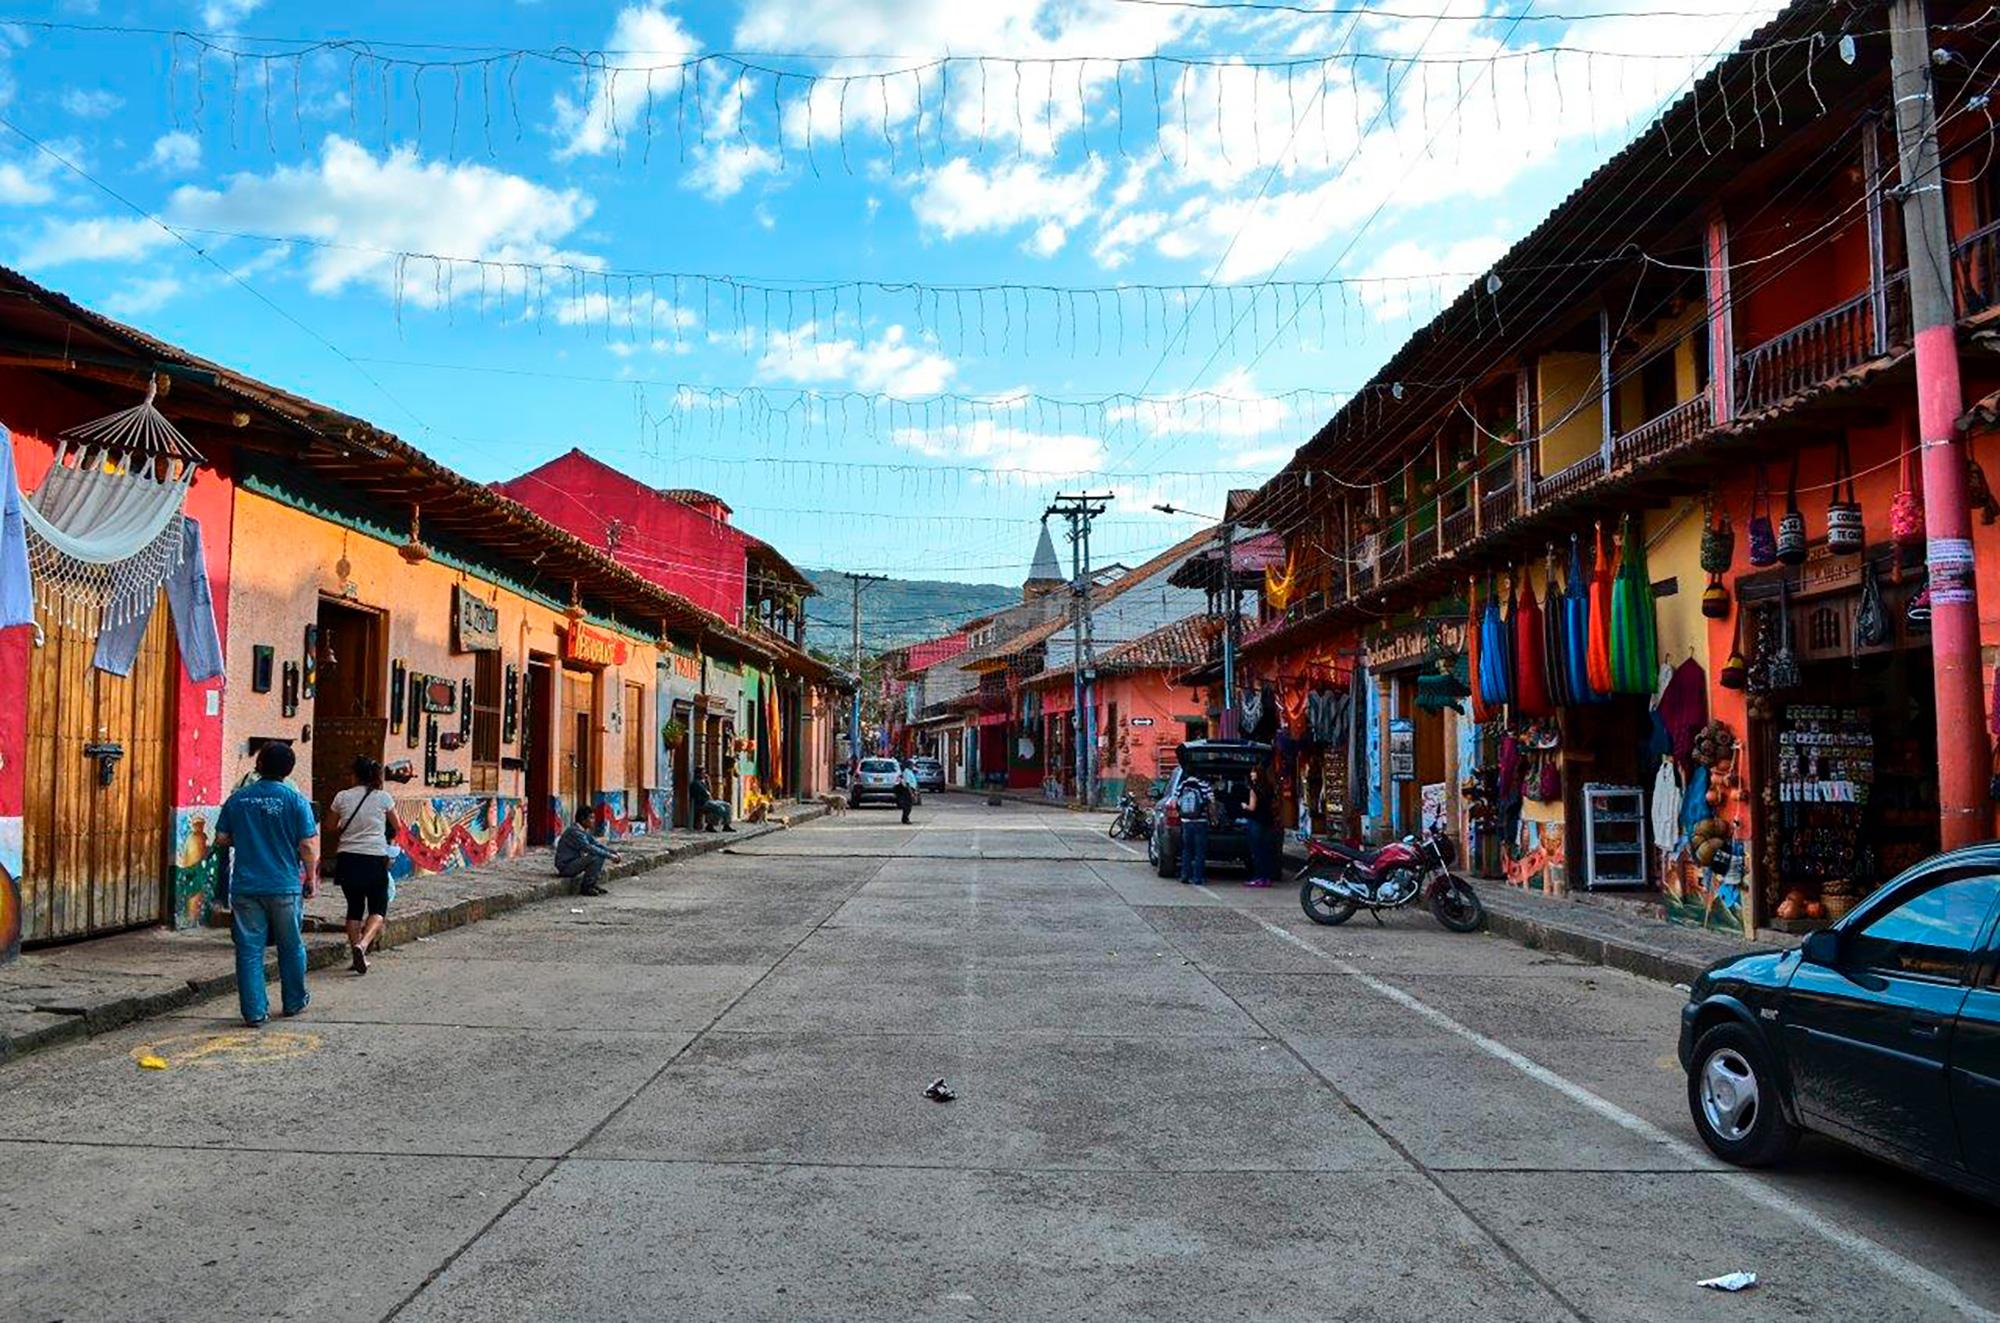 Viaje en Grupo a Colombia - Colombia- imagen #8